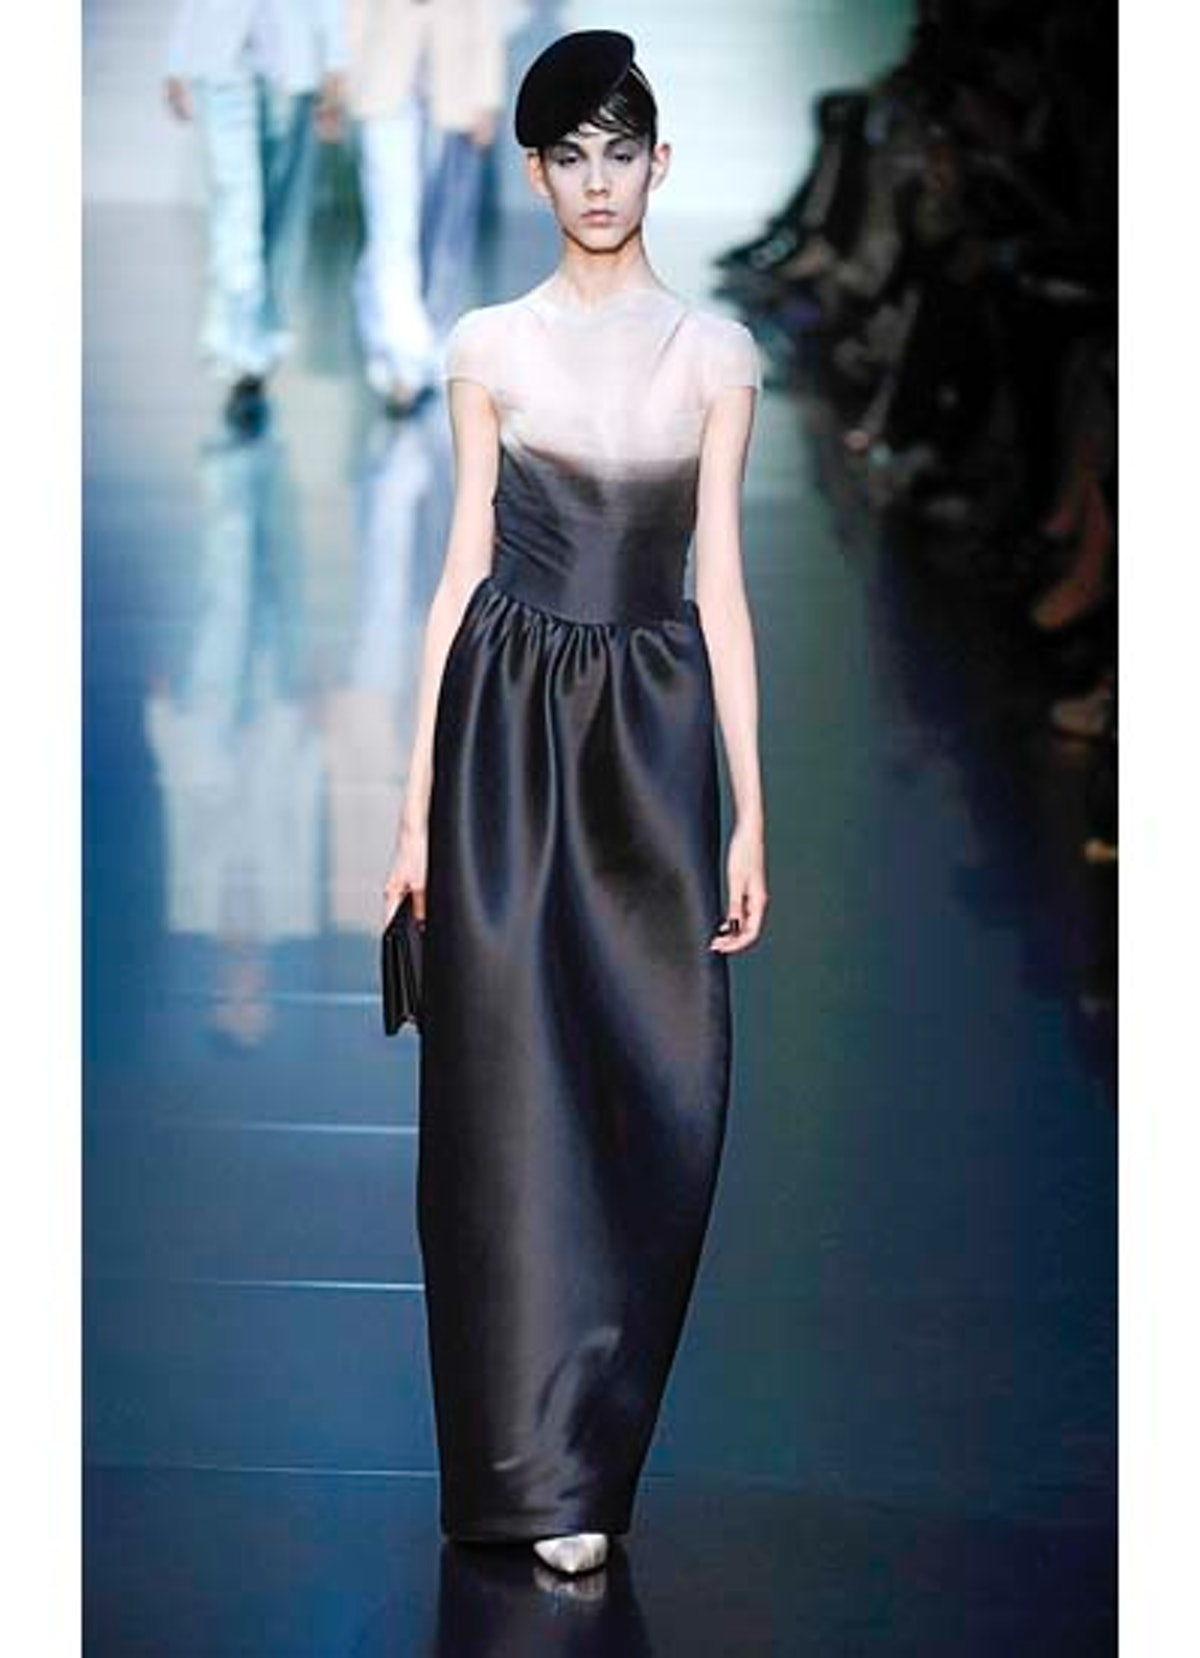 fass-giorgio-armani-couture-2012-runway-10-v.jpg